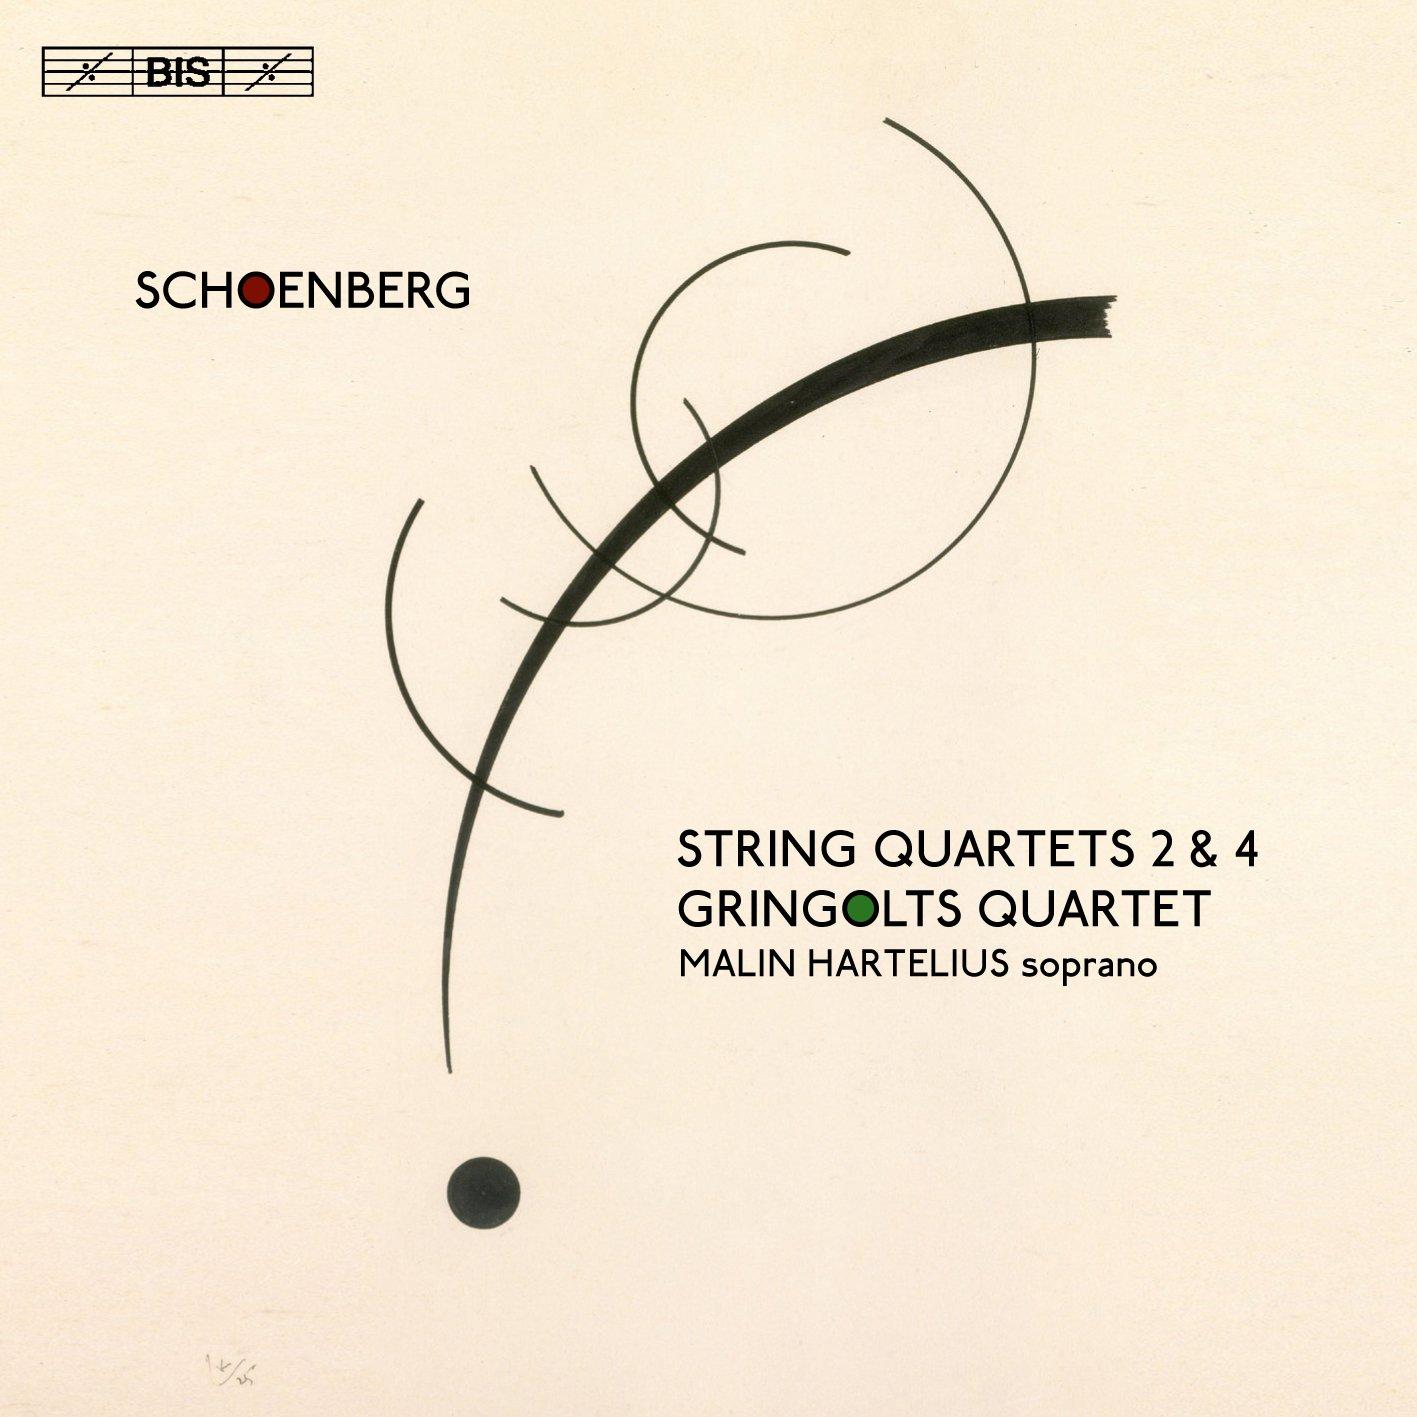 SACD : Gringolts Quartet - Malin Hartelius - String Quartets 2 & 4 (Hybrid SACD)